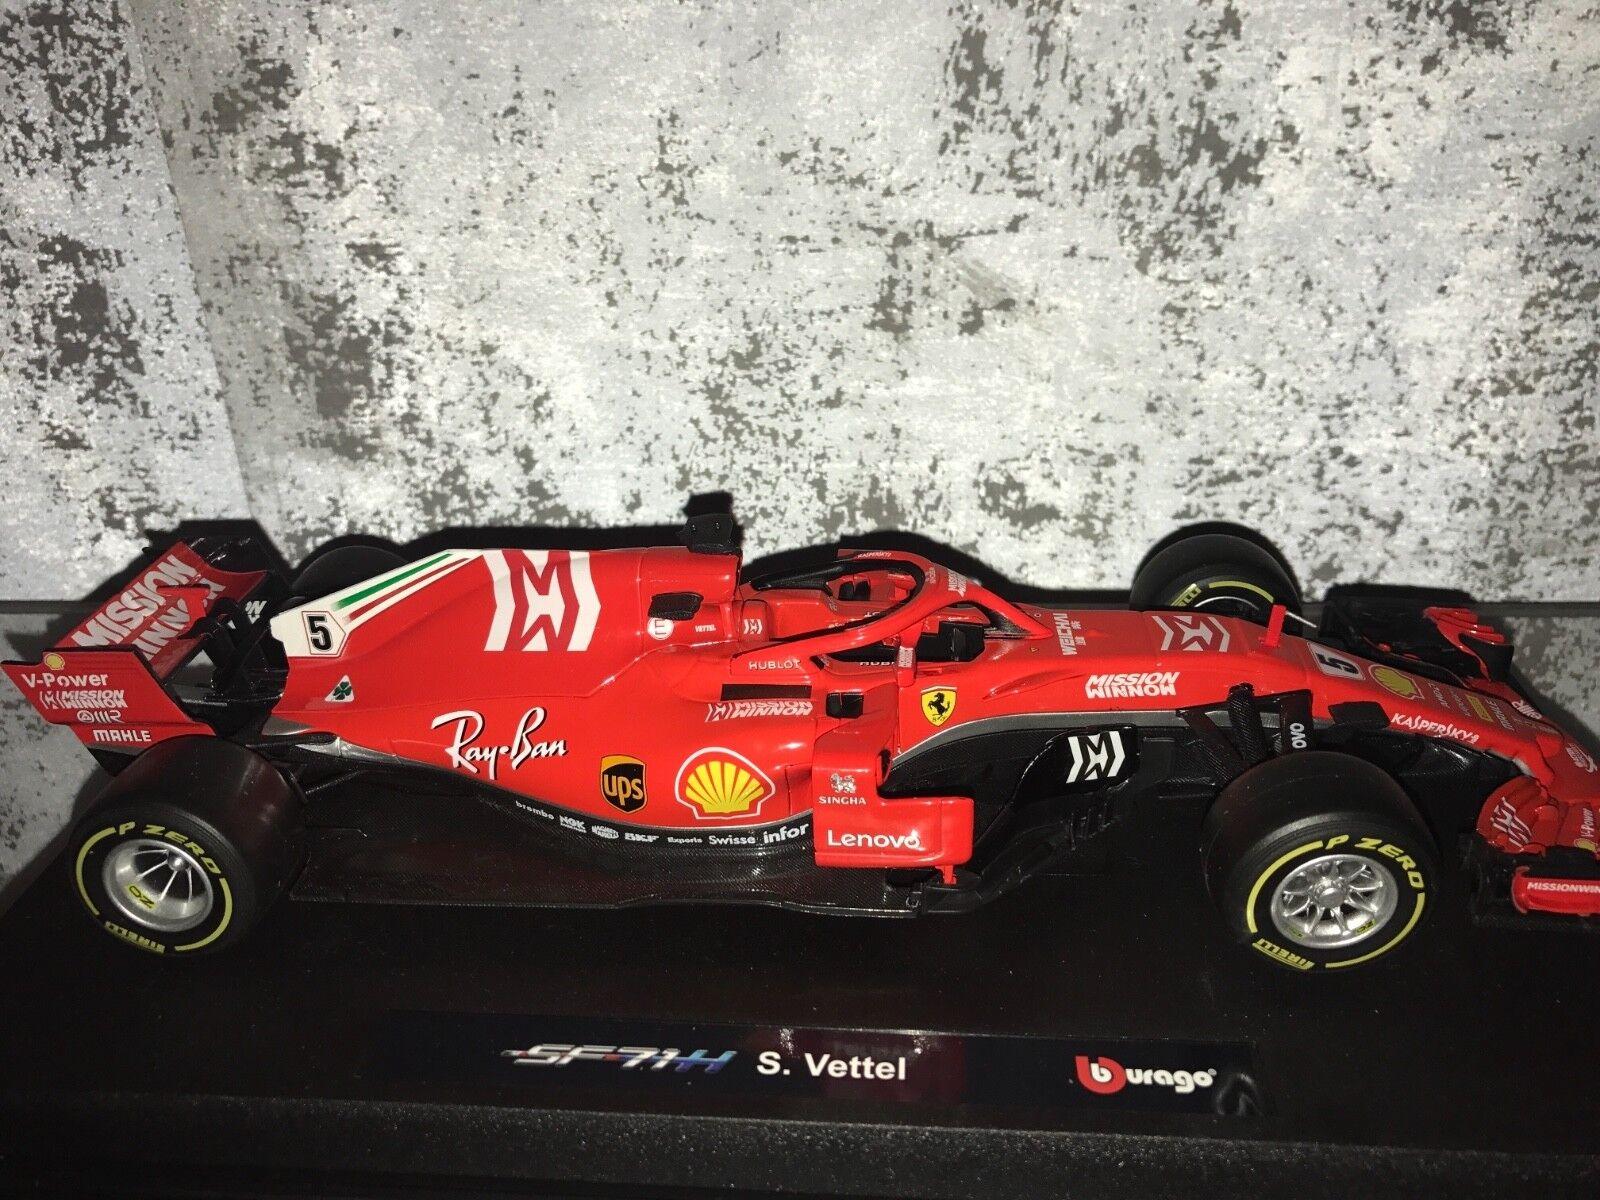 Ferrari sf 71 vettel mission win 1 18 2018   ferrari vettel 2018